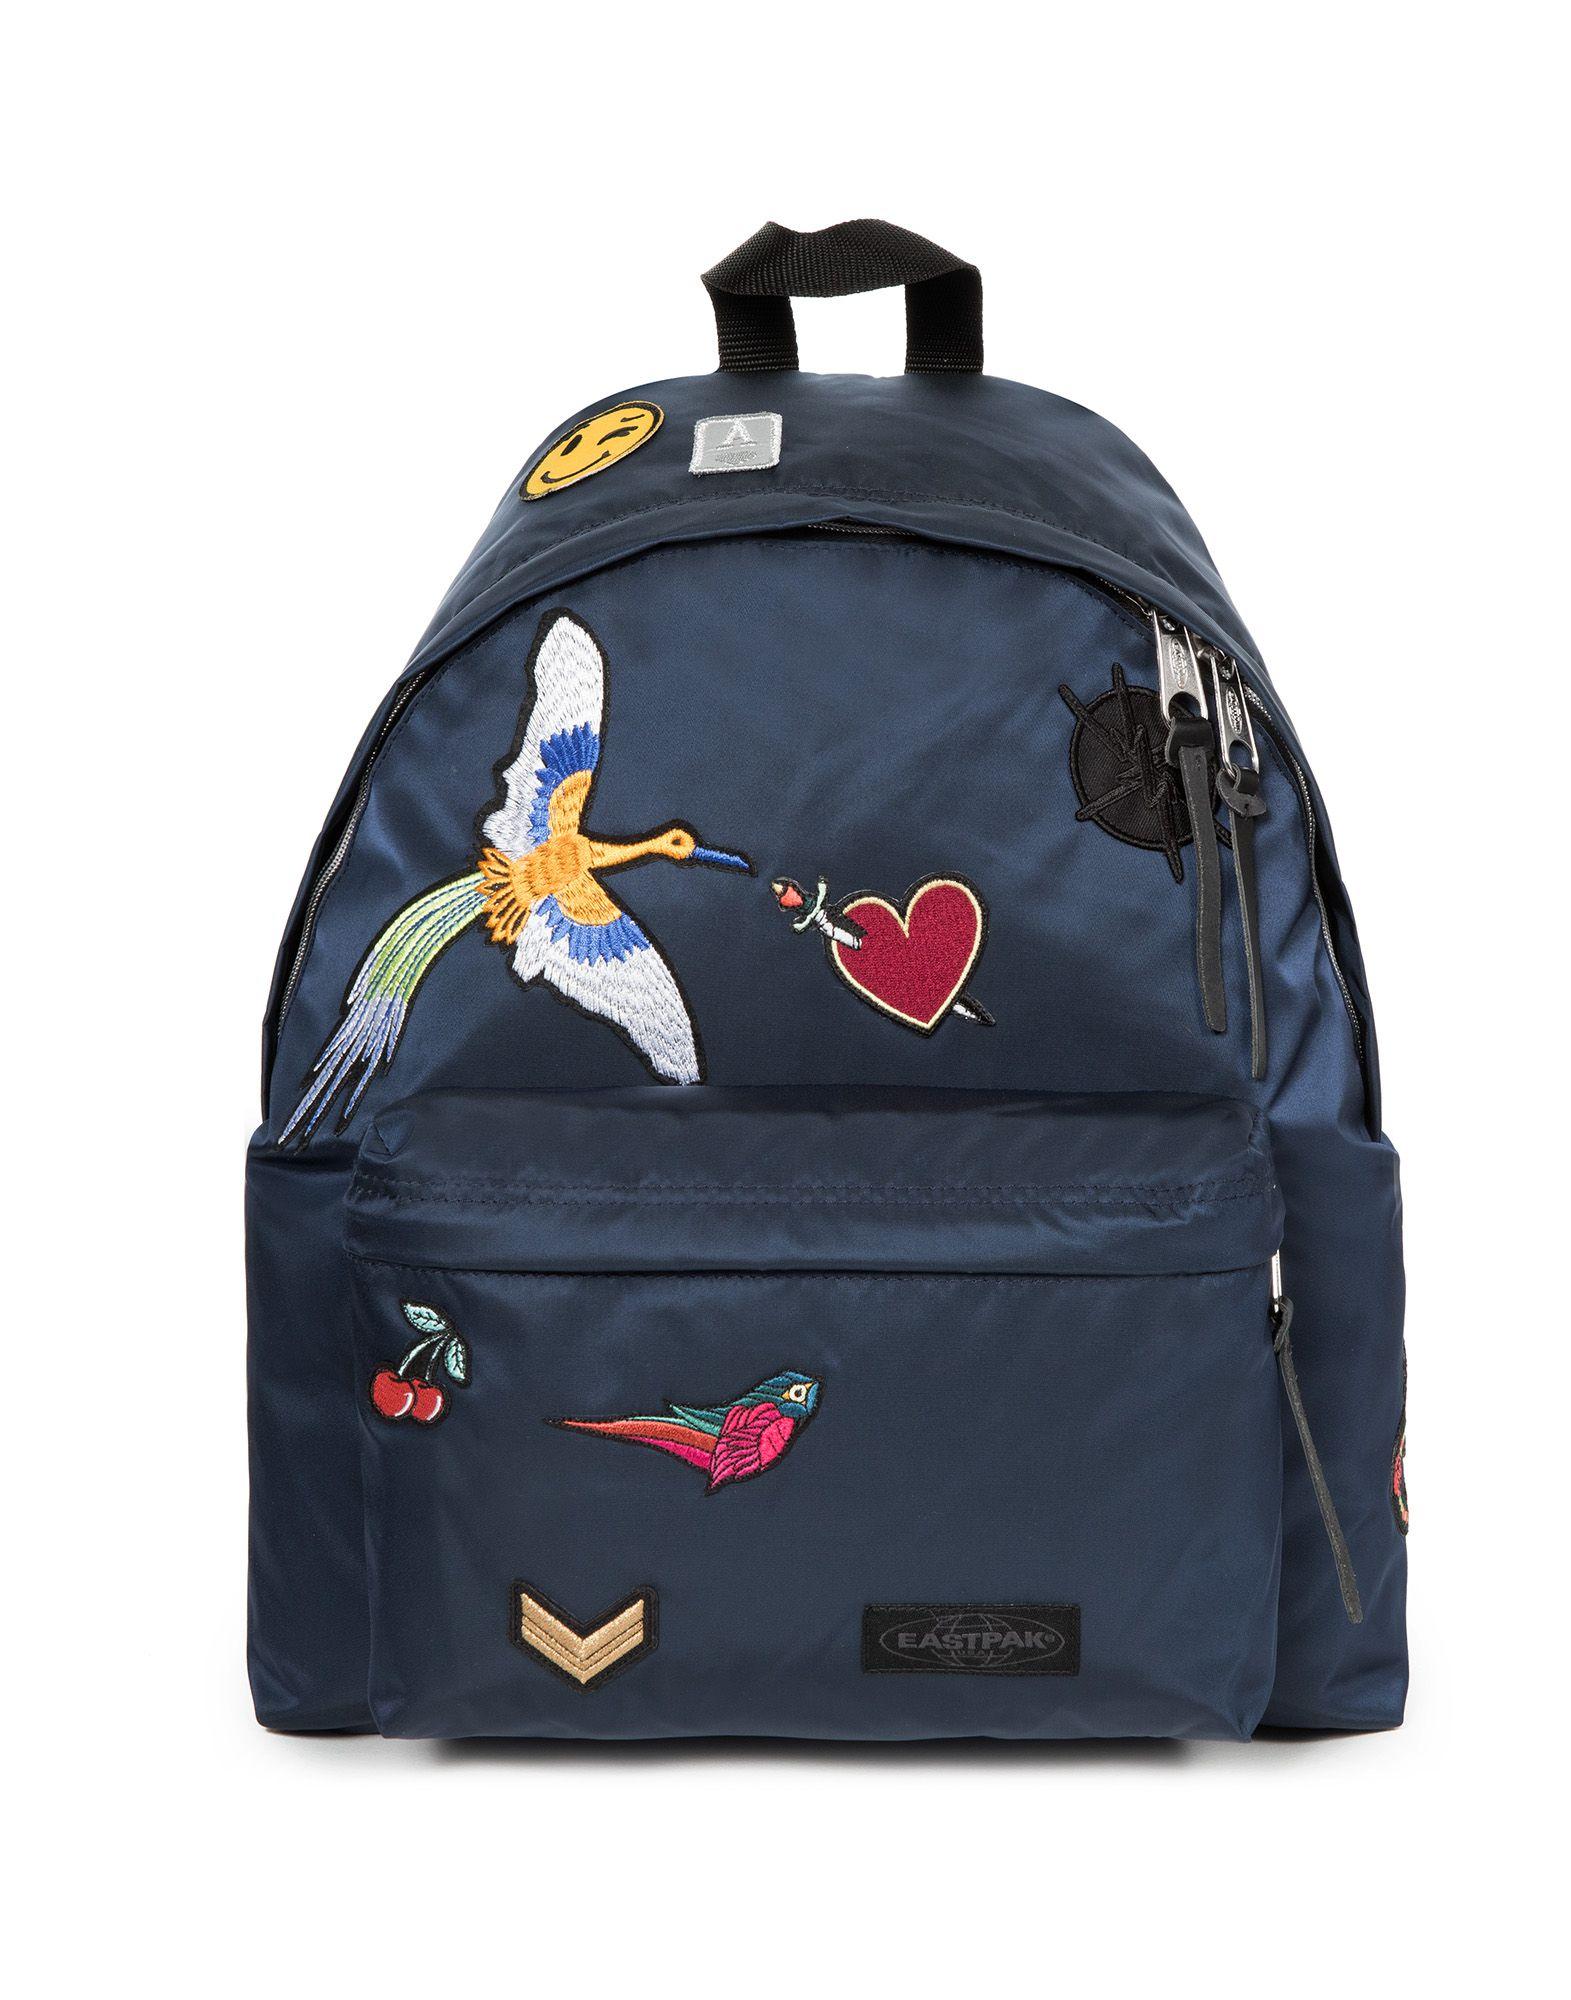 EASTPAK Рюкзаки и сумки на пояс мешки для пыли vesta bs 03 для bosch